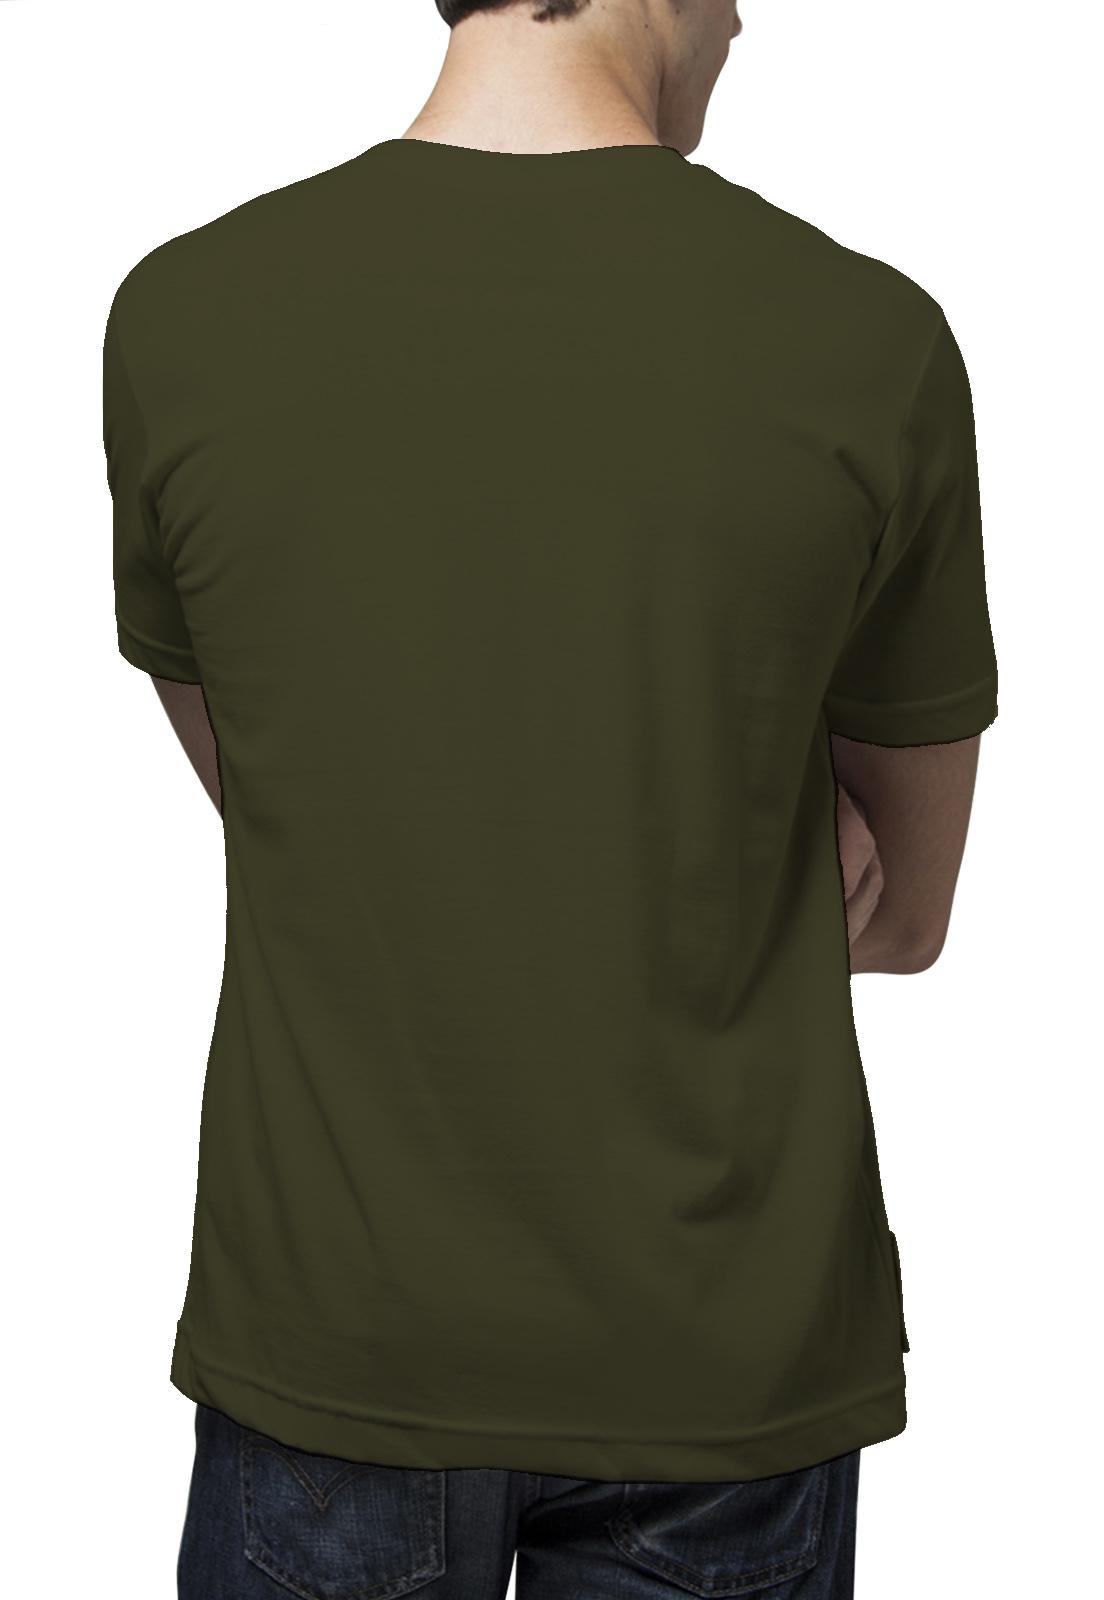 Camiseta Amazônia Cenas Floresta - Verde Escuro